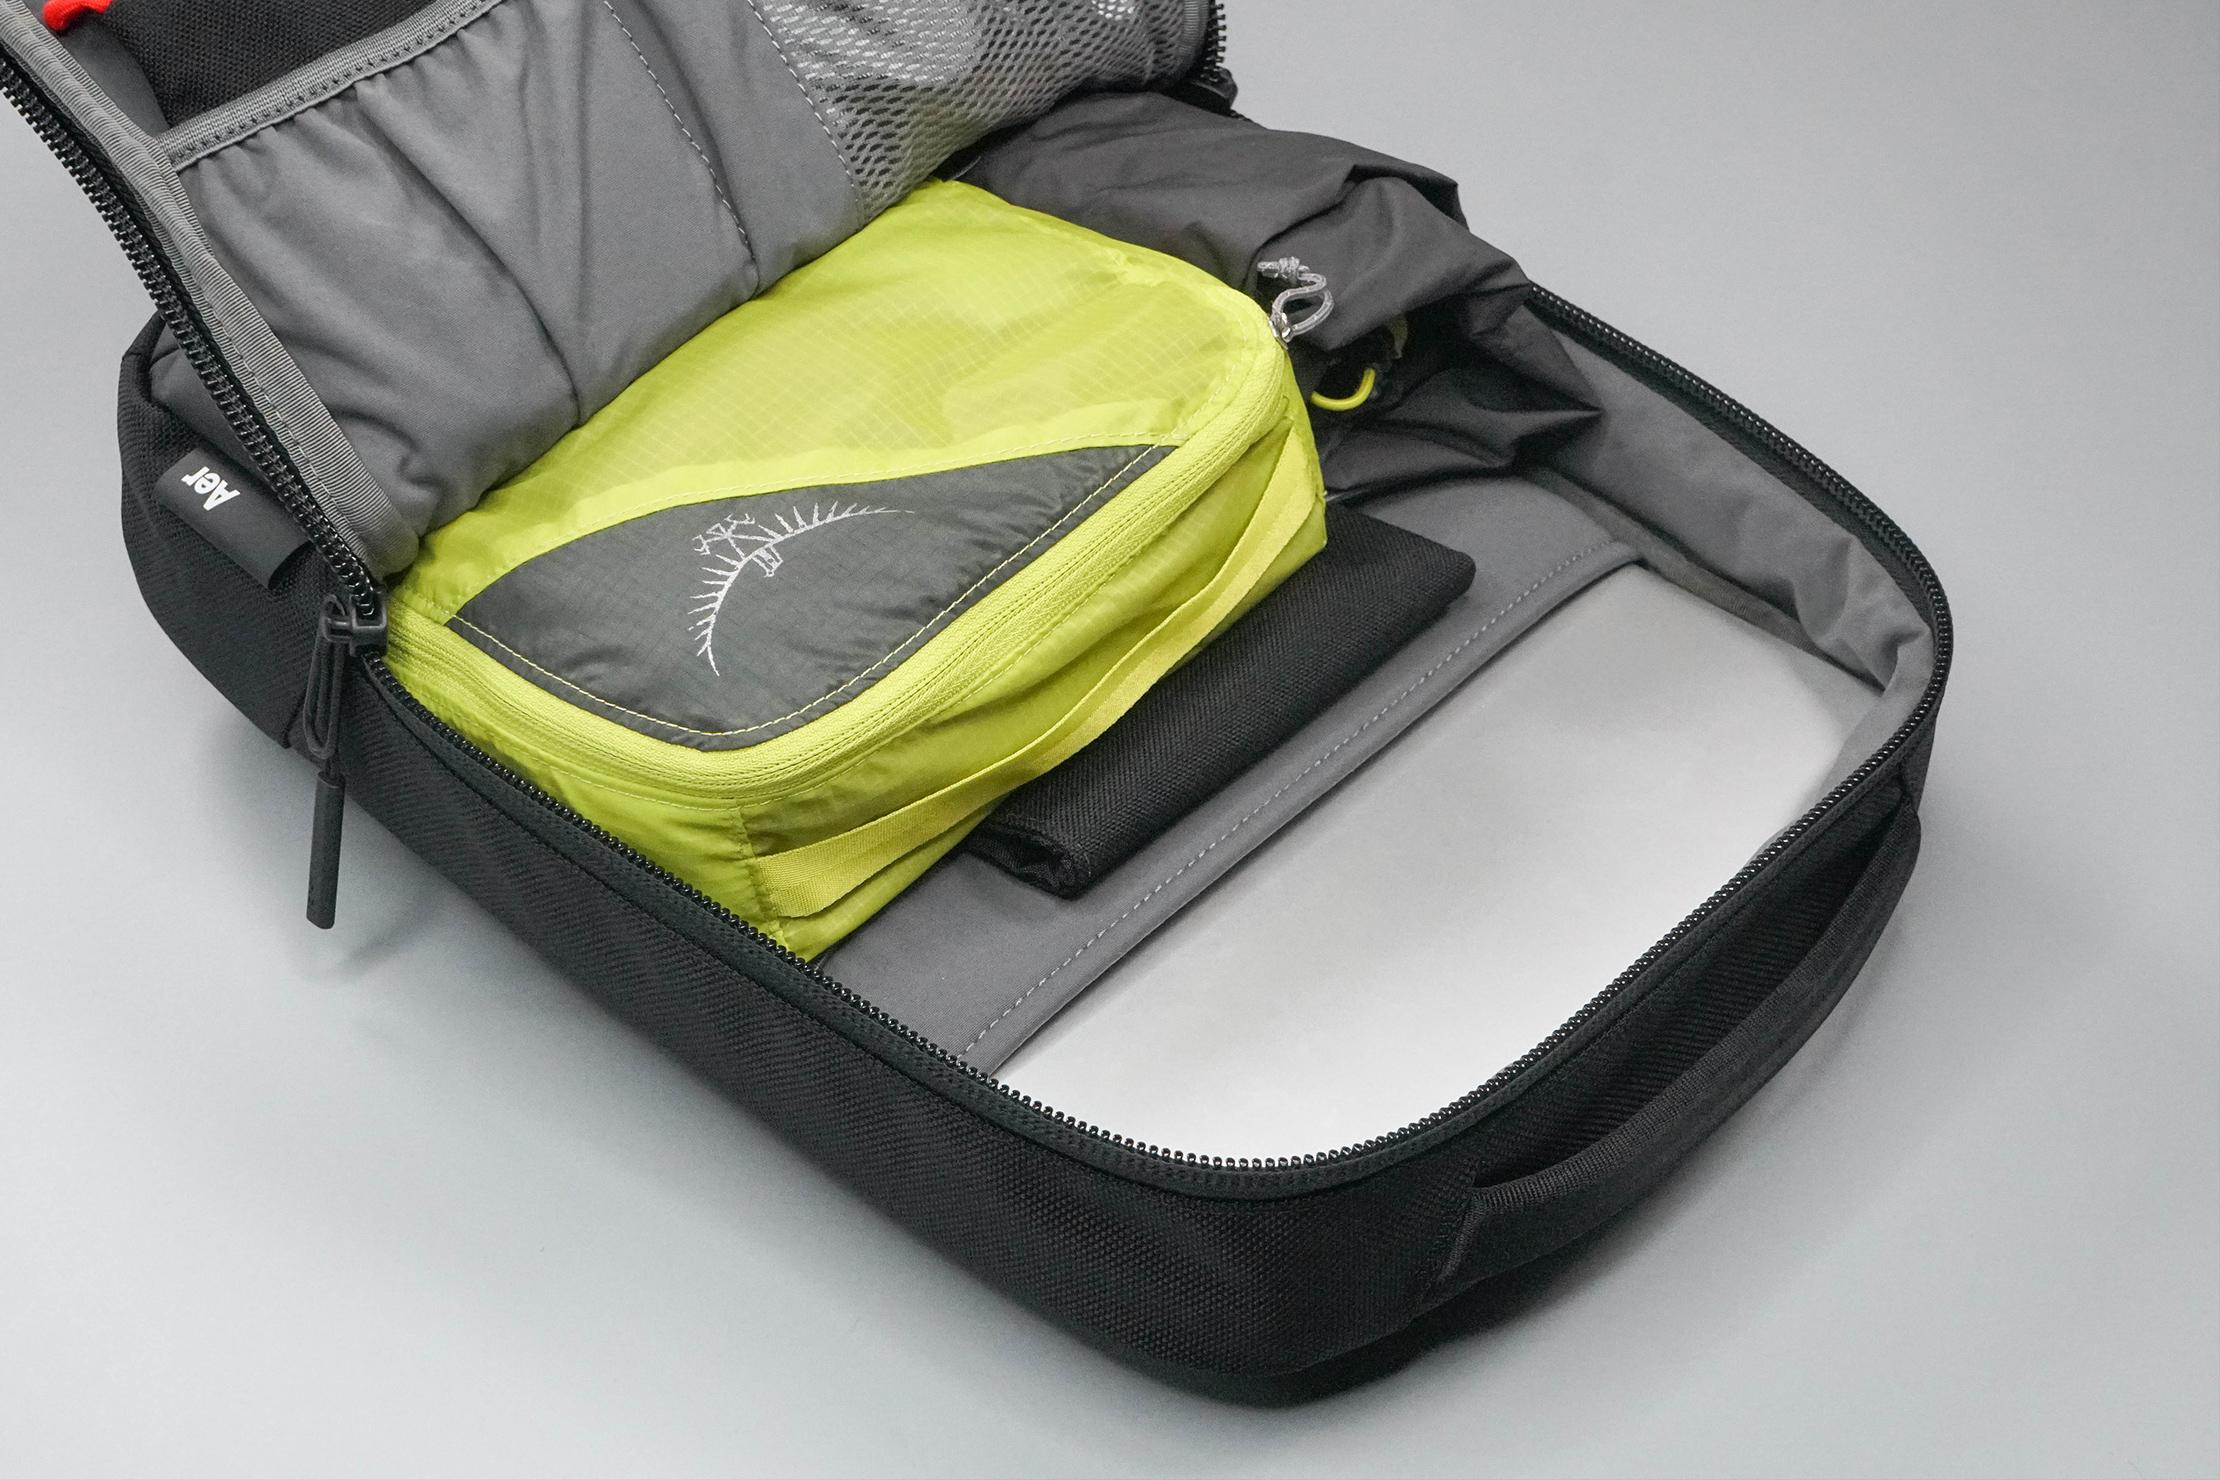 Aer Slim Pack Main Compartment